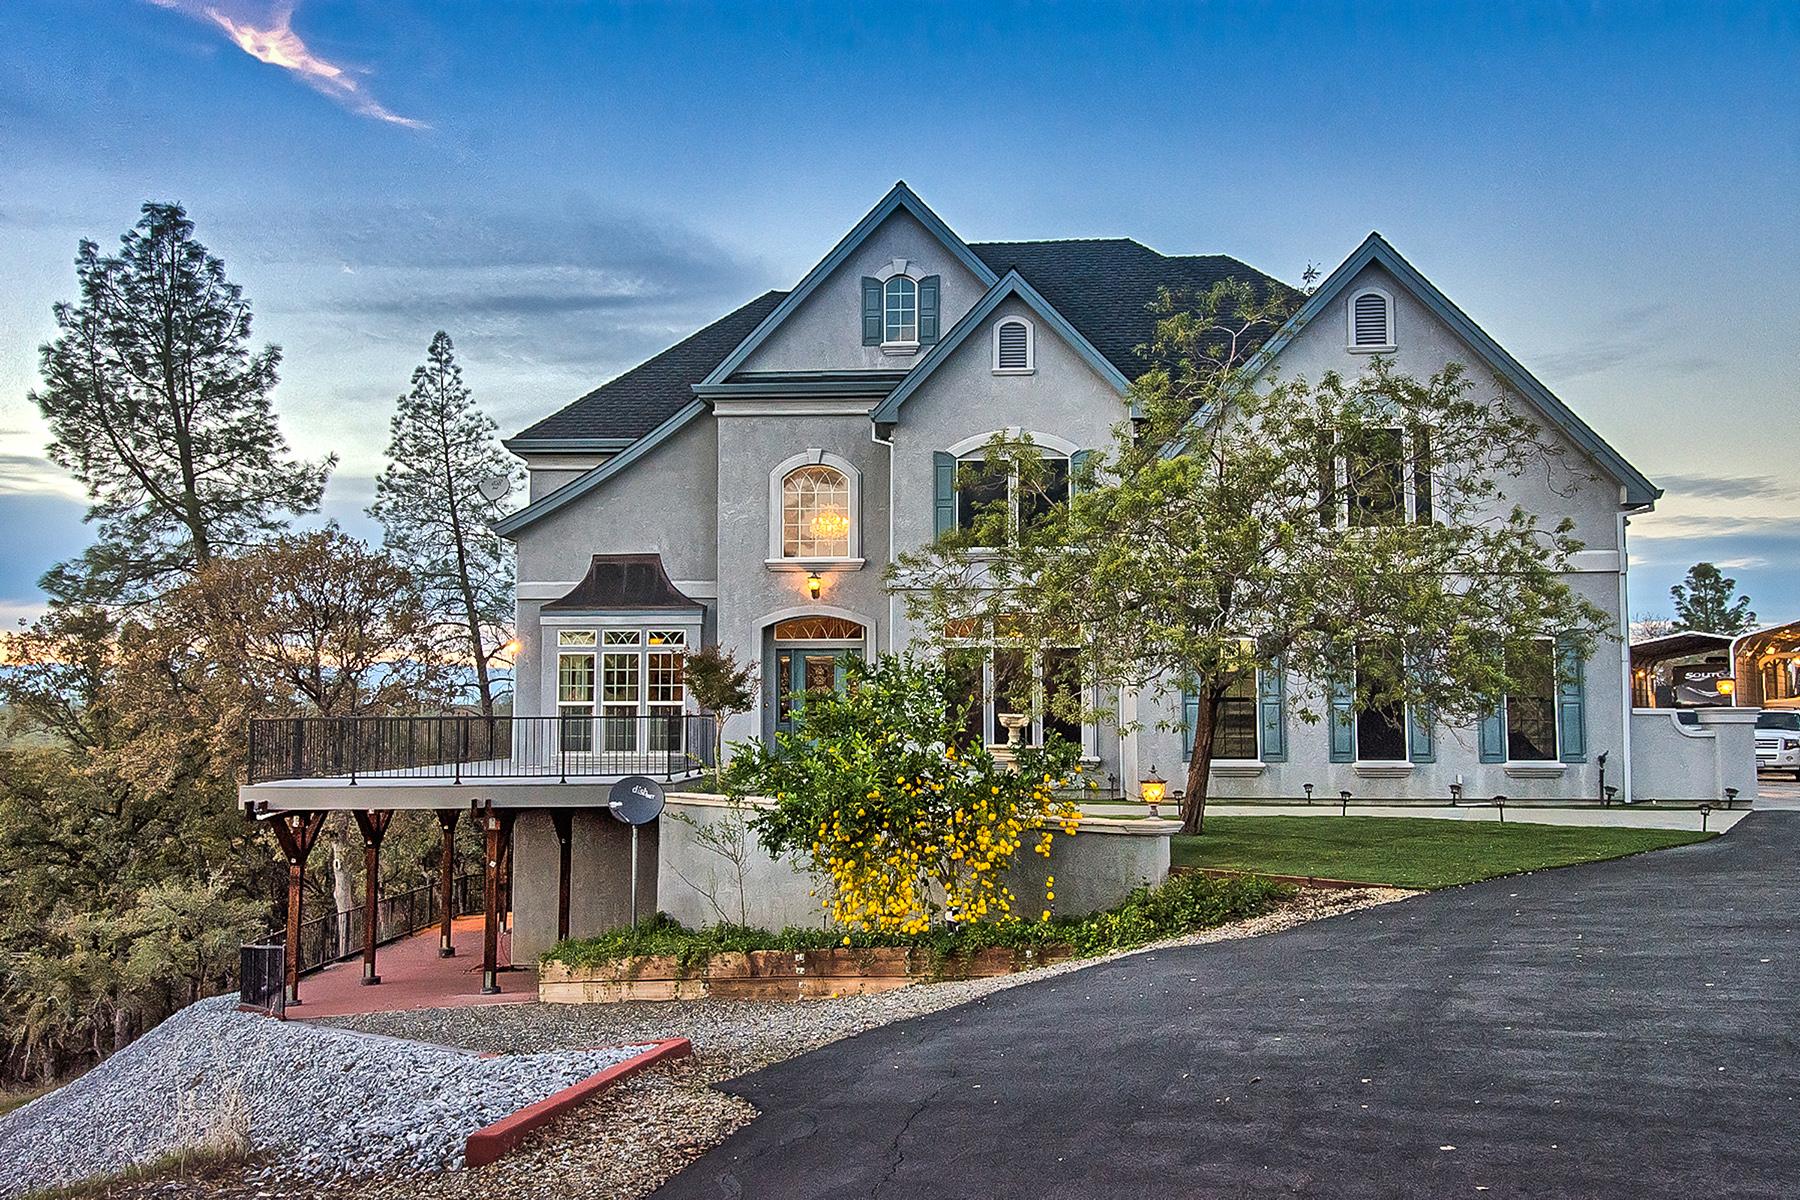 独户住宅 为 销售 在 Elegance and Inspiring Views in Quail Ridge Ranch 17465 Quail Ridge RD Cottonwood, 加利福尼亚州 96022 美国